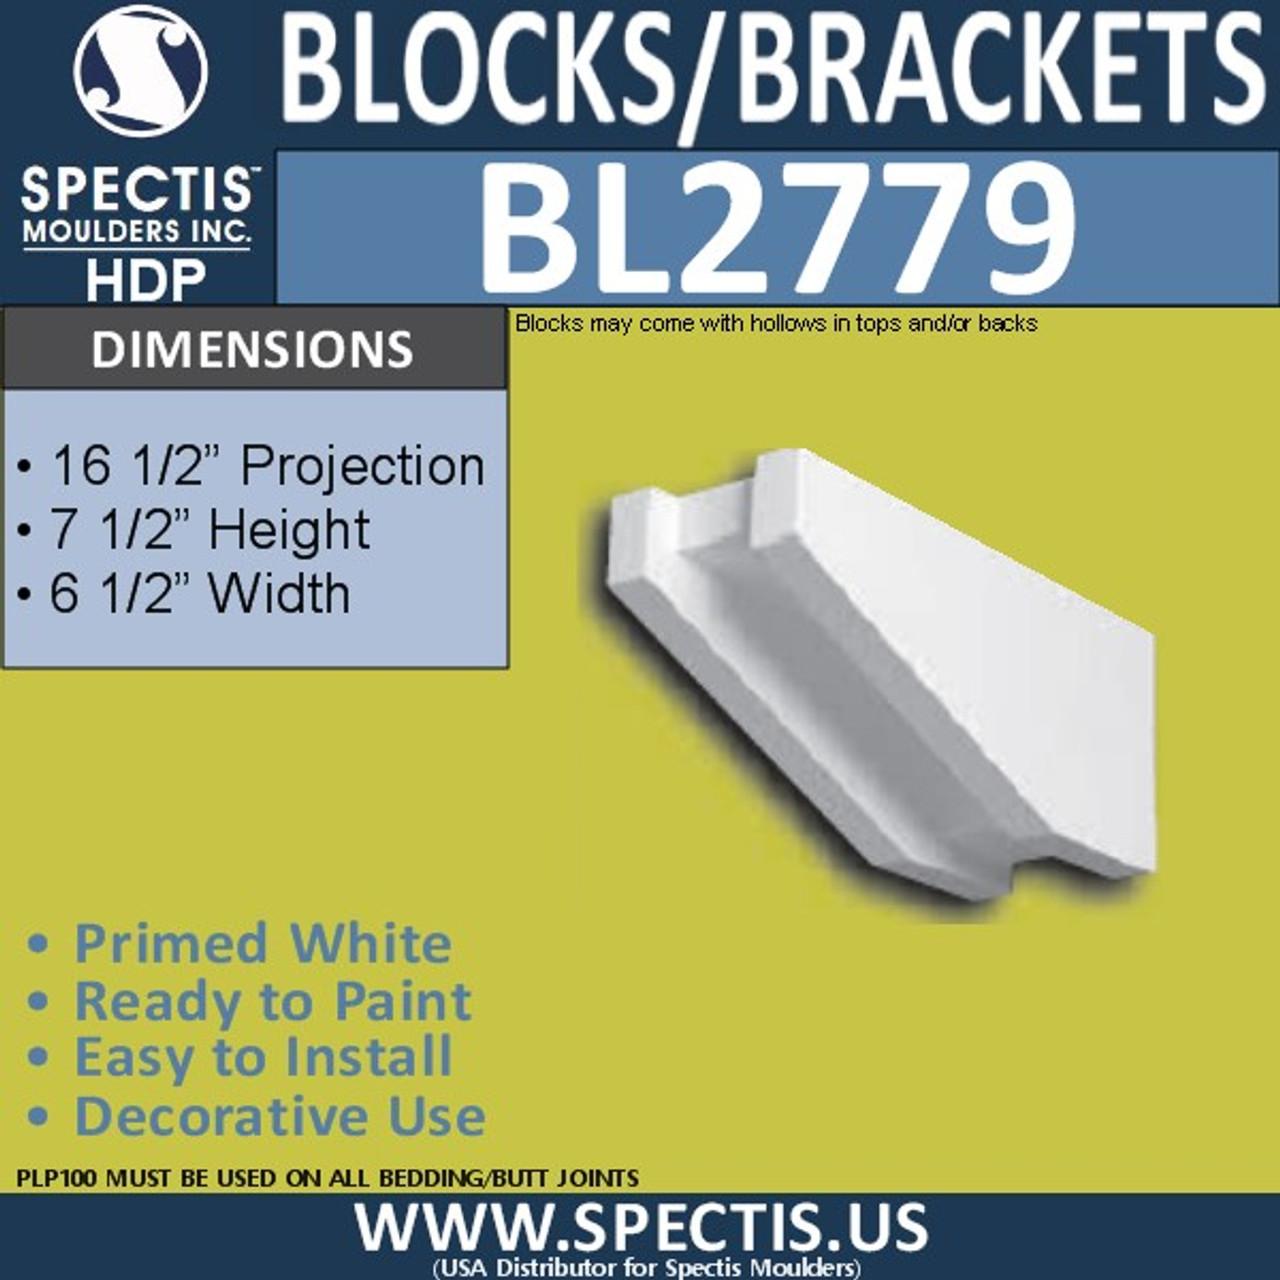 "BL2779 Eave Block or Bracket 6.5""W x 7.5""H x 16.5"" P"